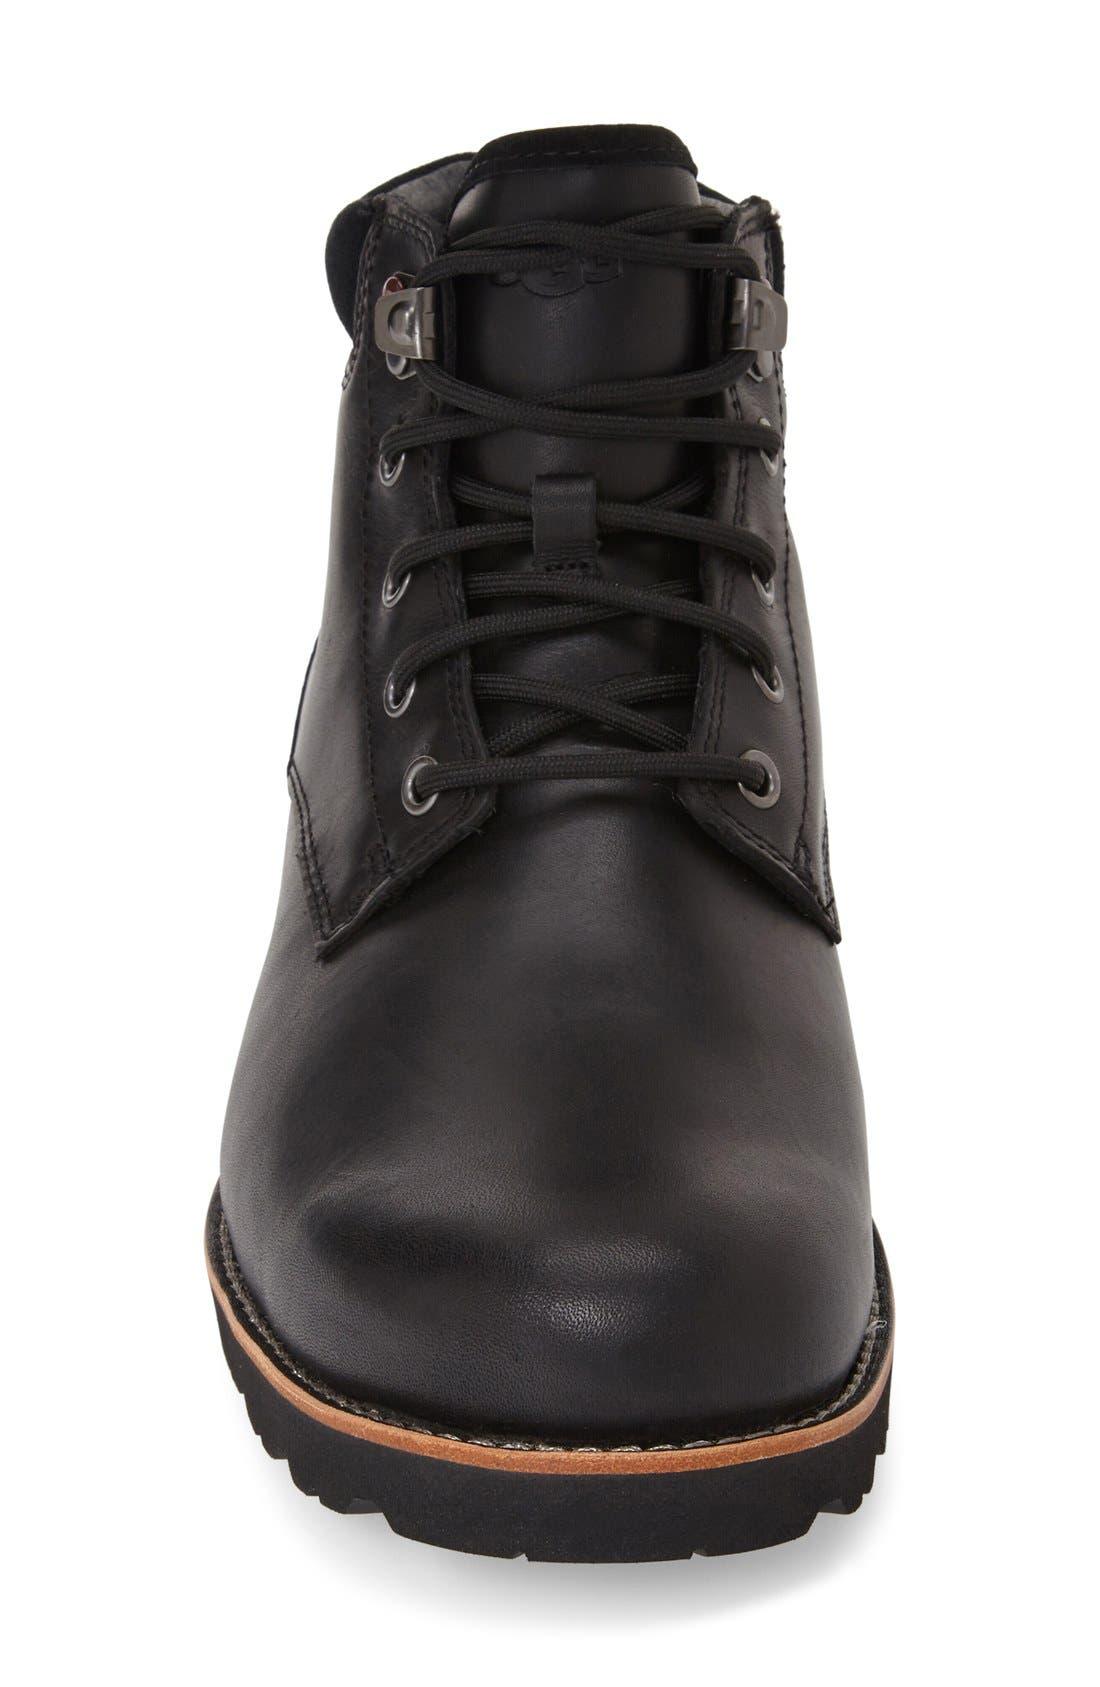 Seton Waterproof Chukka Boot,                             Alternate thumbnail 3, color,                             BLACK